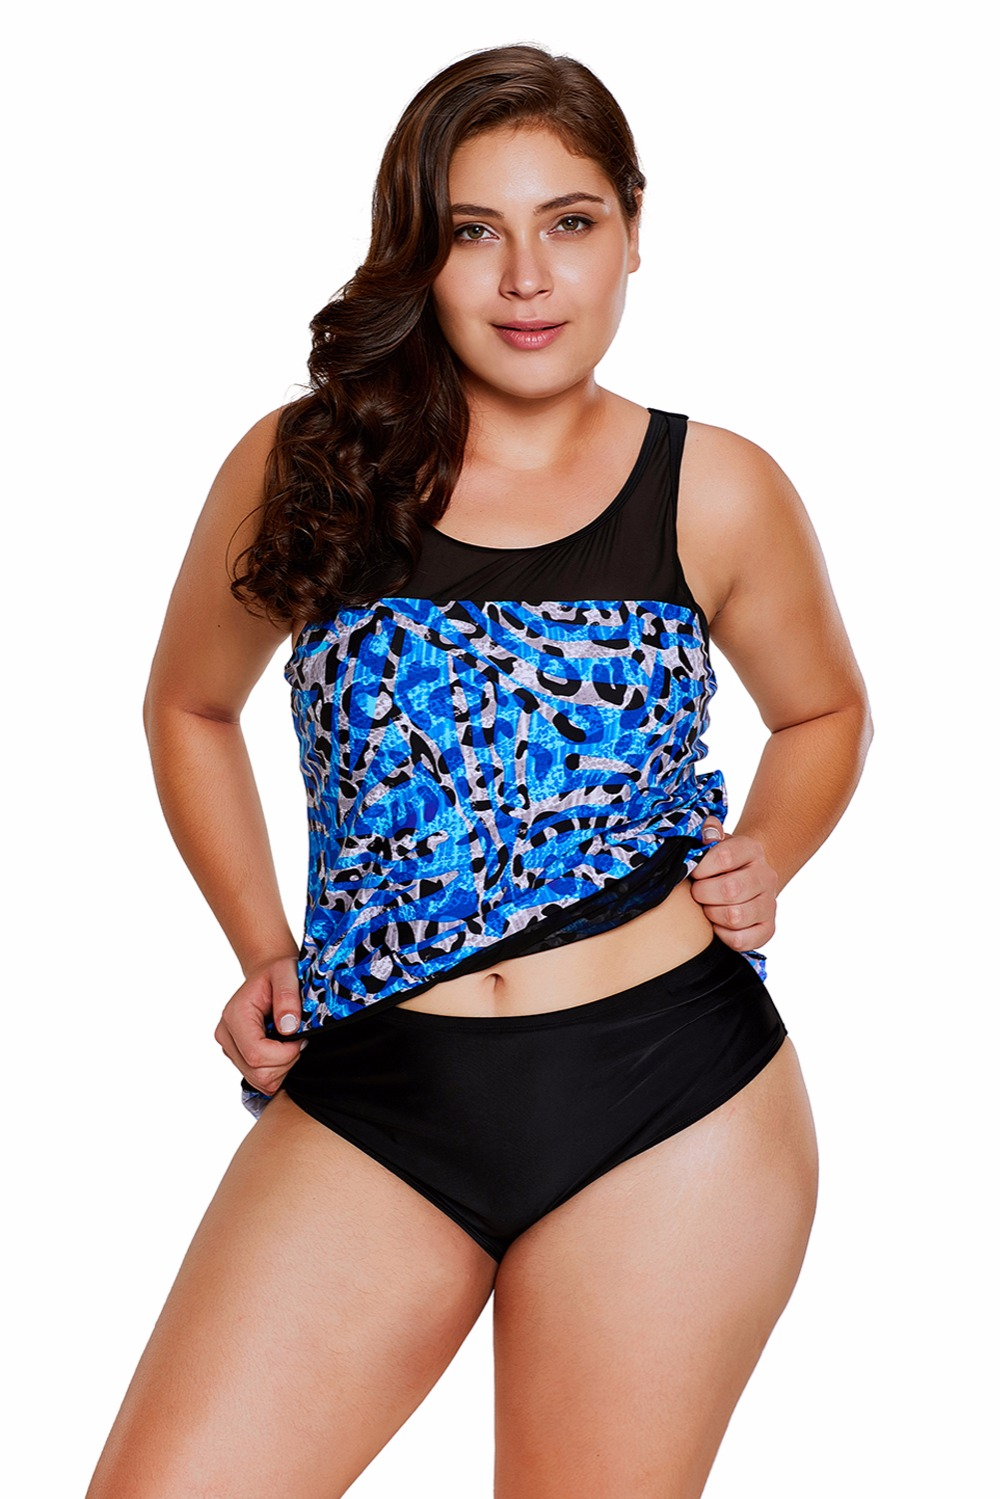 aa6ce1a5c6d8d 2018 Seaglass Mirage Asymmetric Mesh Tankini Swimsuit Plus Size ...